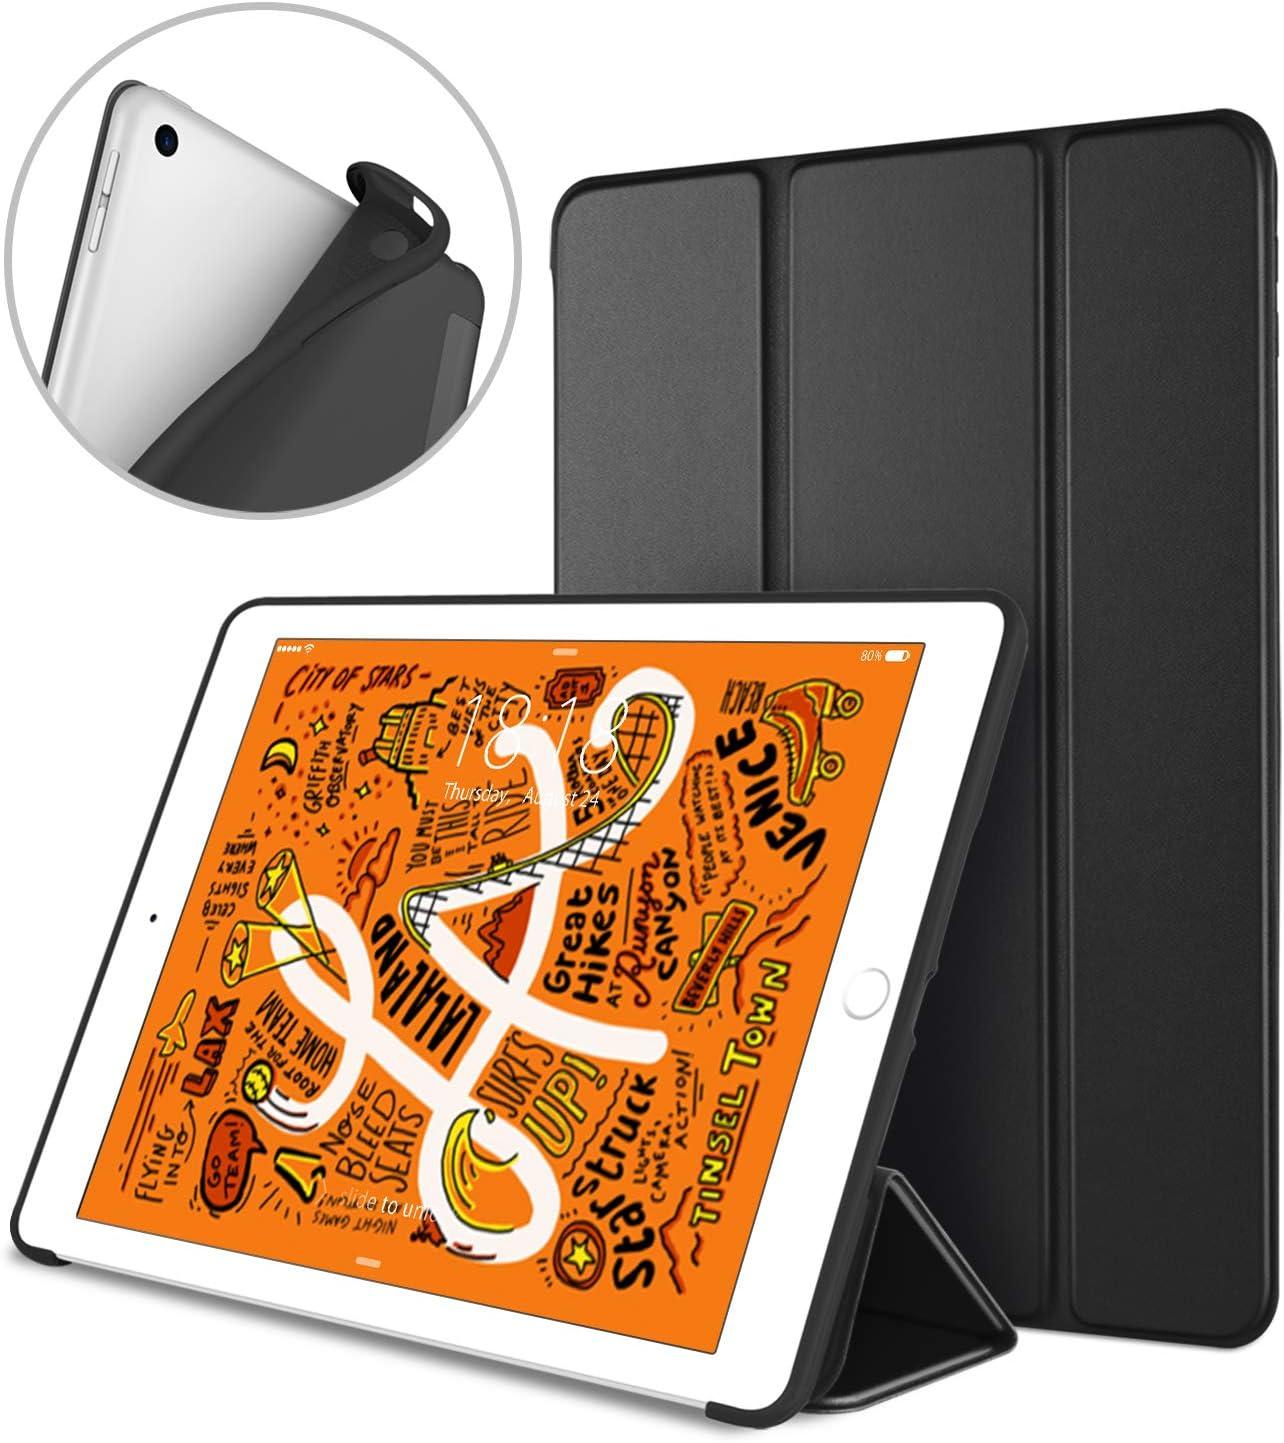 DTTO iPad Mini 5th Generation 2019 Case, [Gentle Series] Smart Cover Trifold Stand Soft Back Cover for iPad Mini 5 2019/iPad Mini 4 2015 [Auto Sleep/Wake], Black